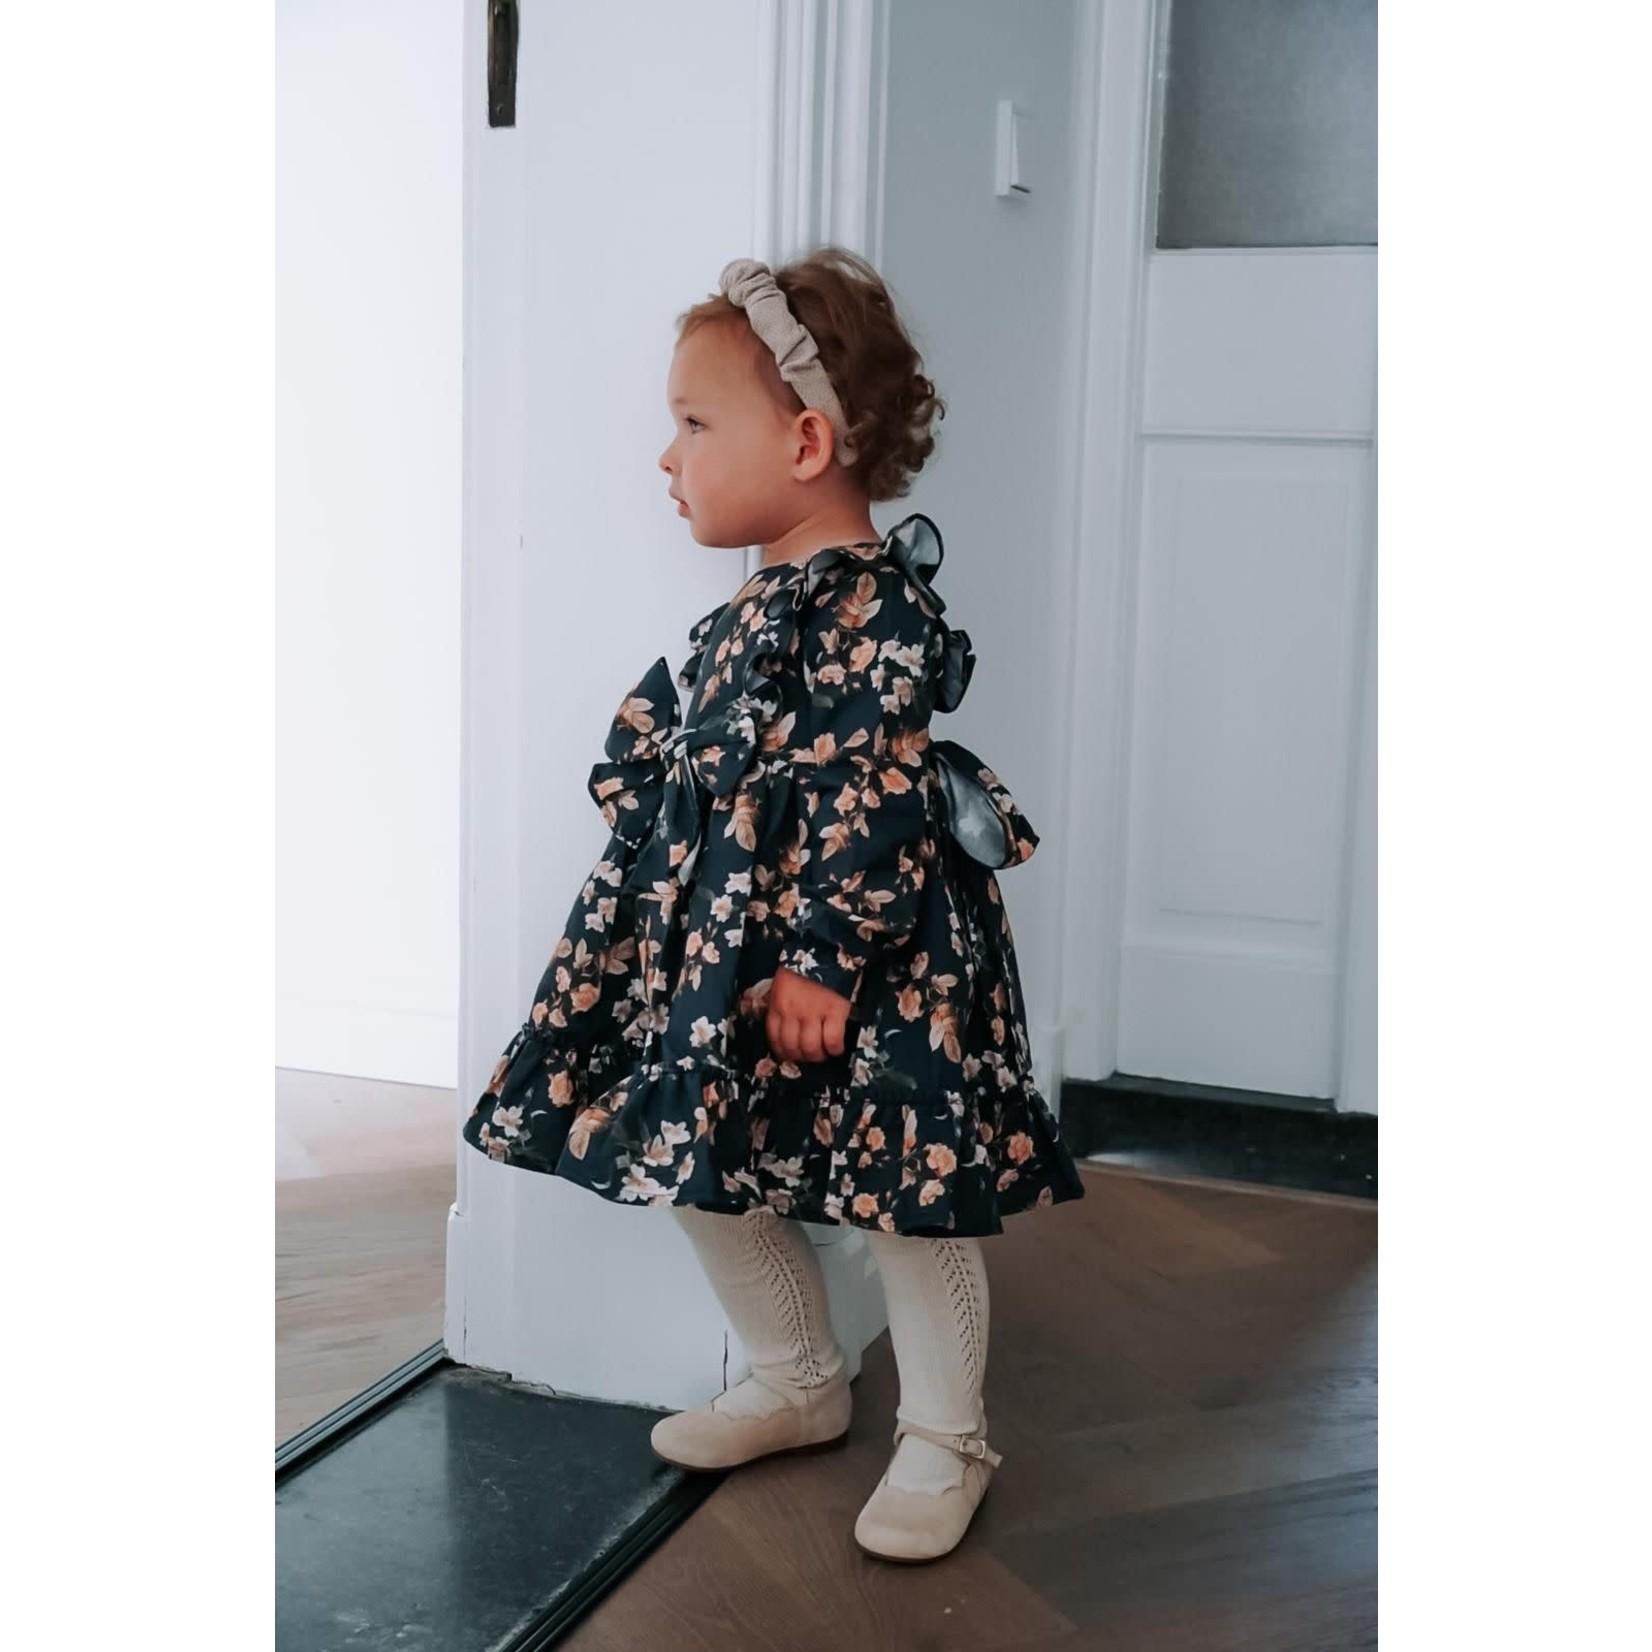 Petite Zara Dress Vienna - Petite Zara